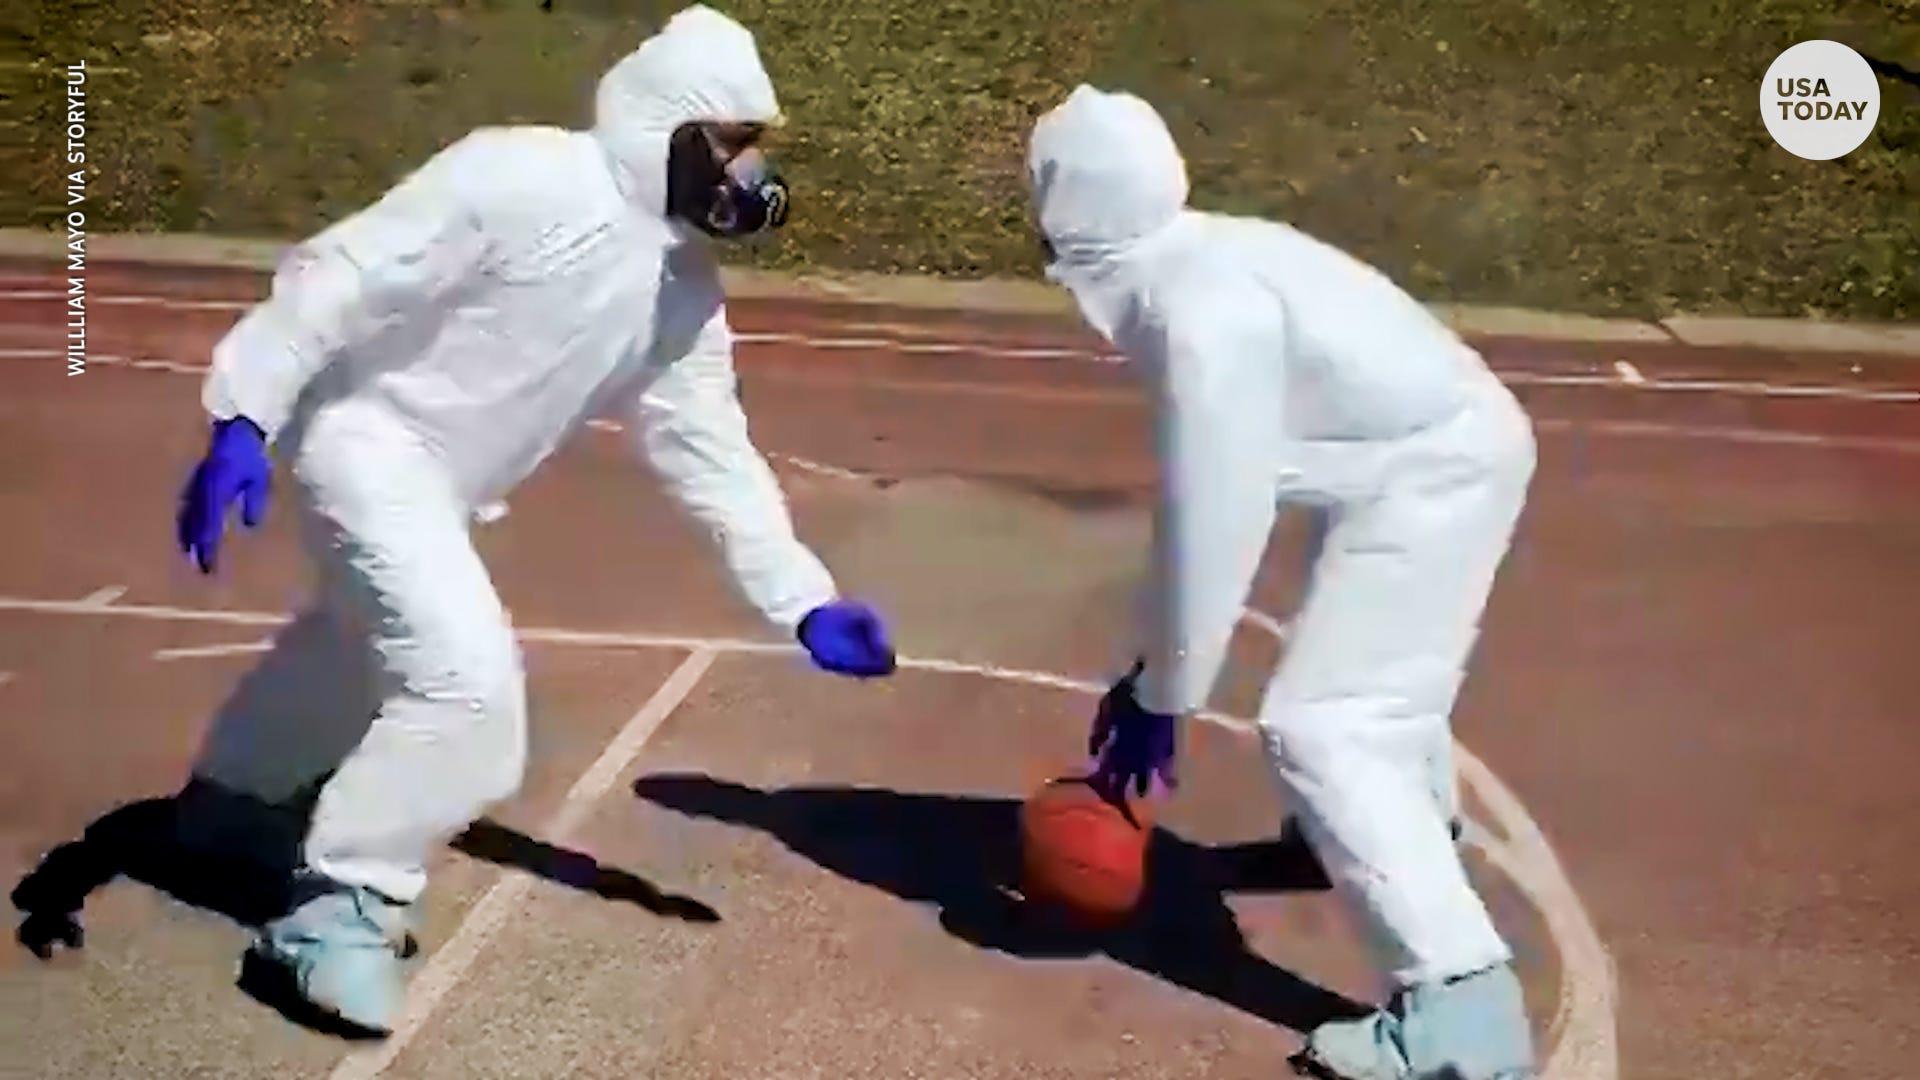 Coronavirus: New York group plays basketball in hazmat suits